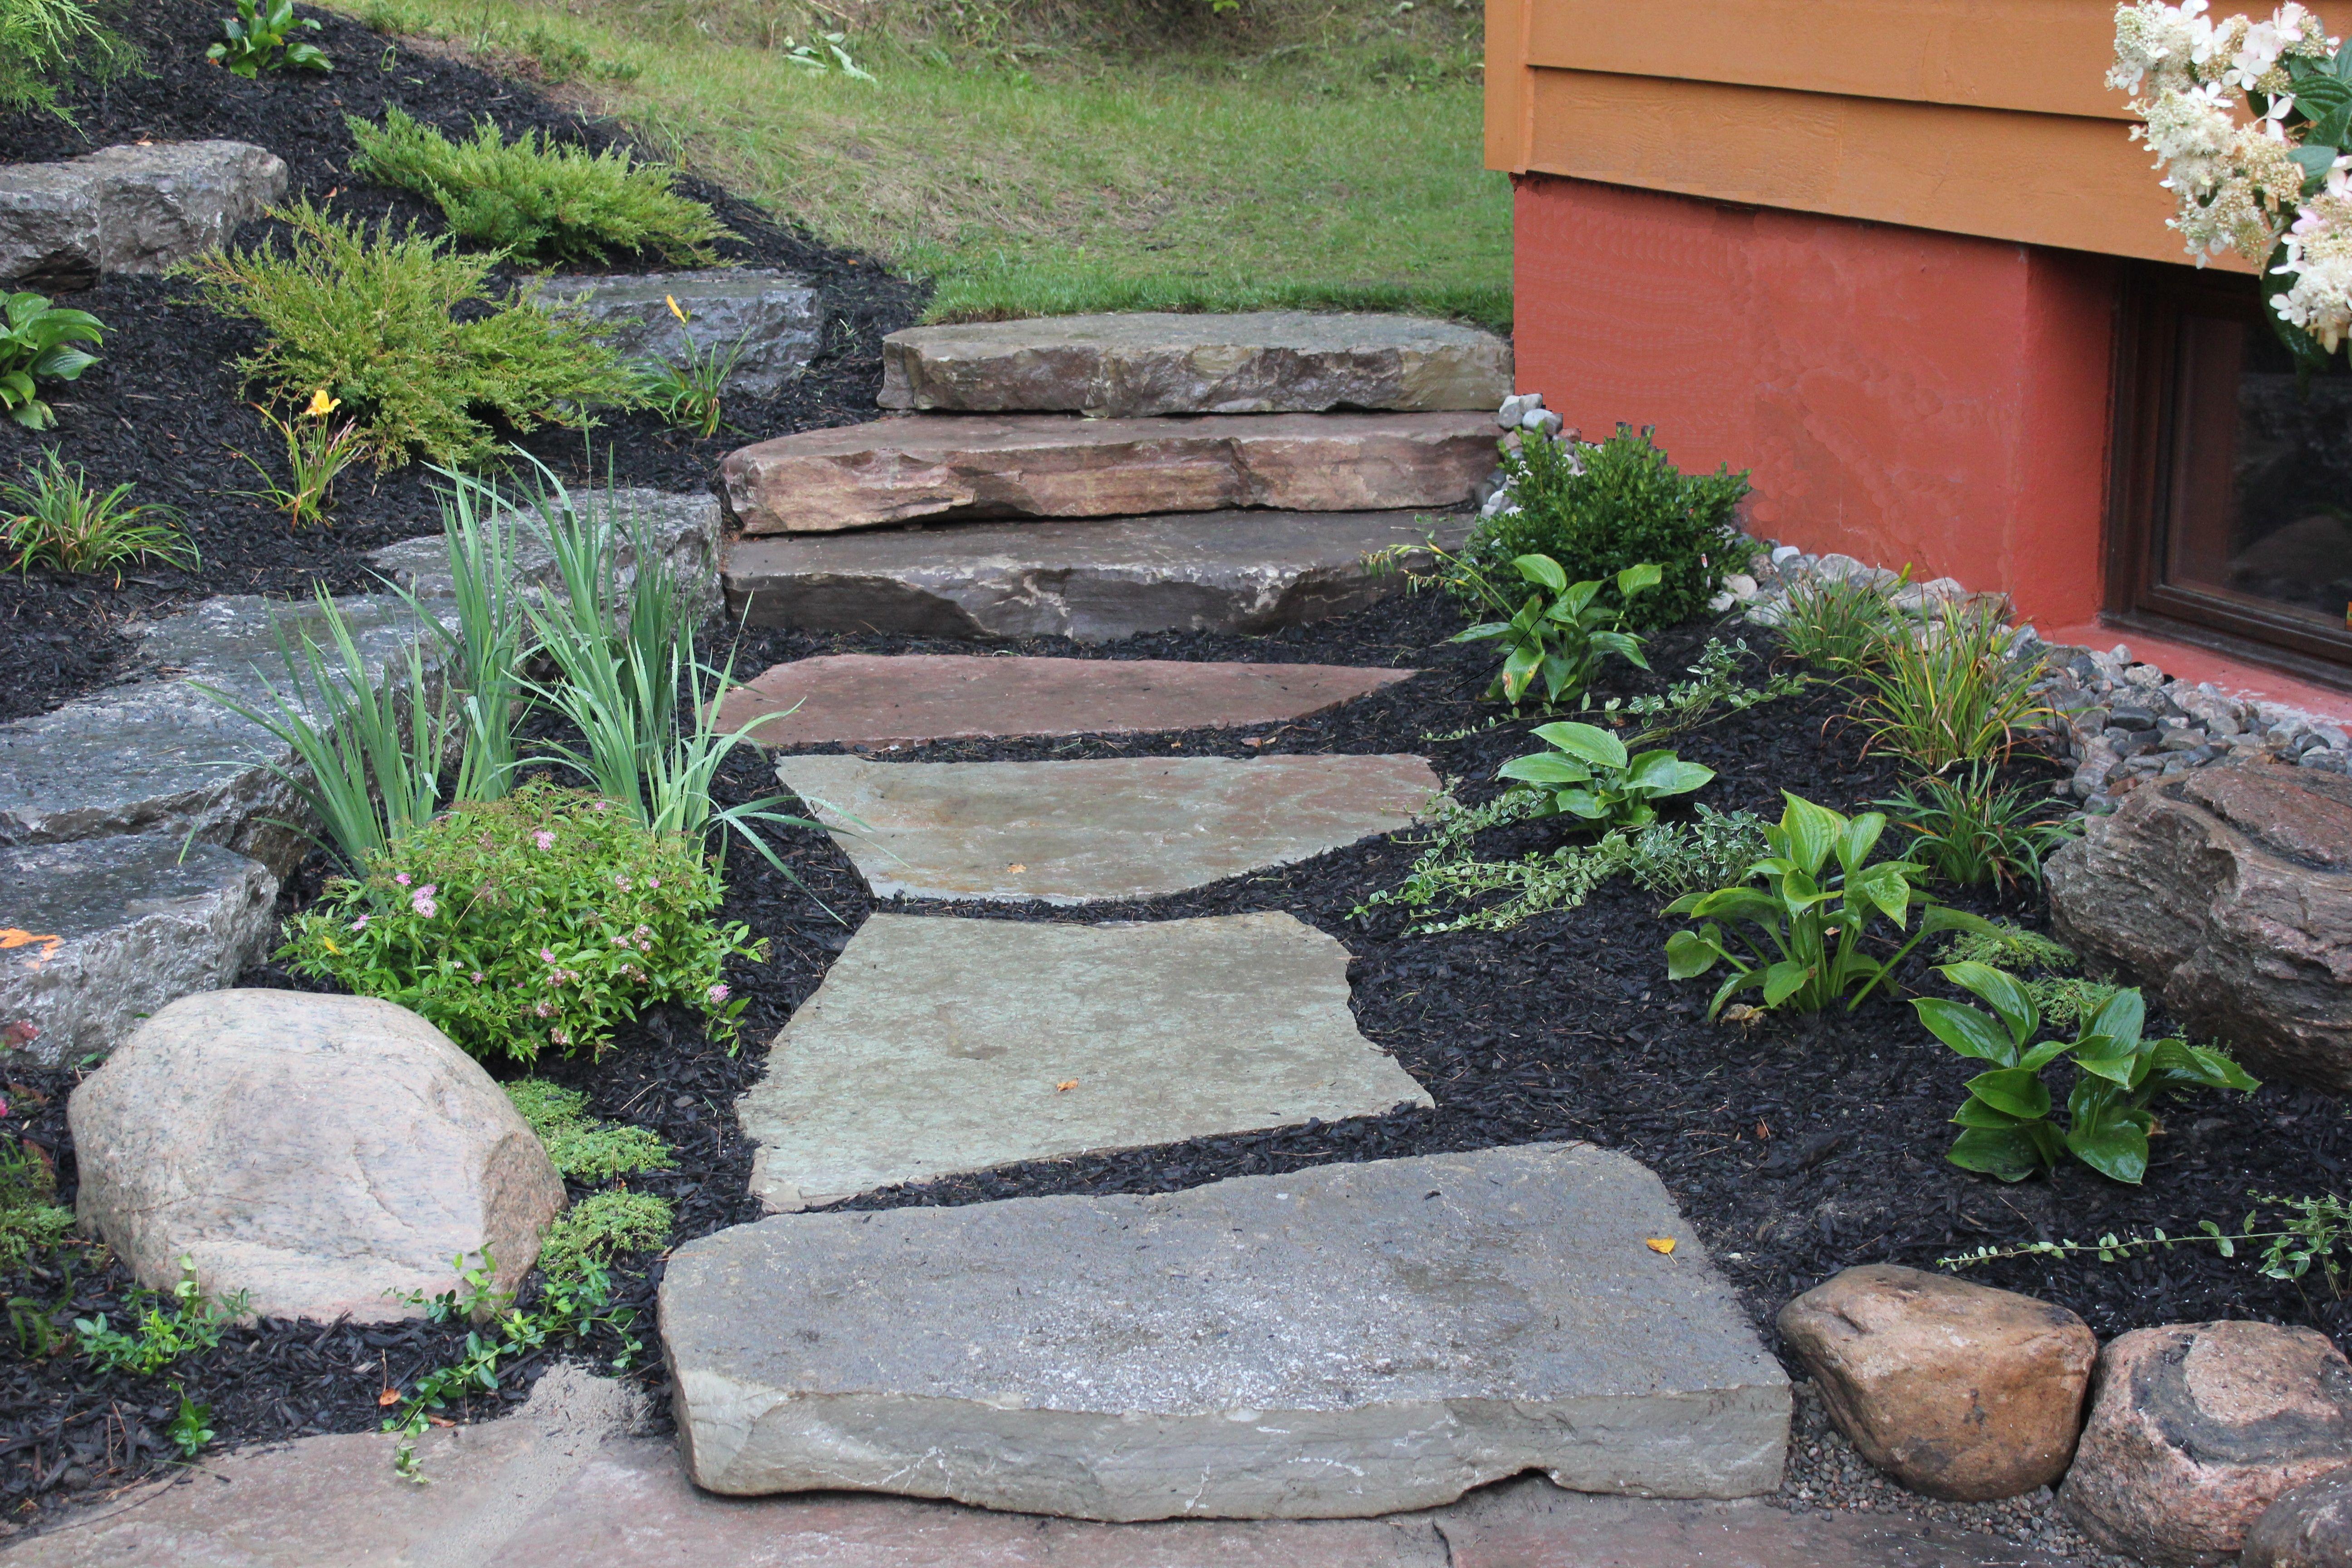 Natural Stone Stepping Stone Walkway Beautiful Gardens Garden Stones Stepping Stone Walkways